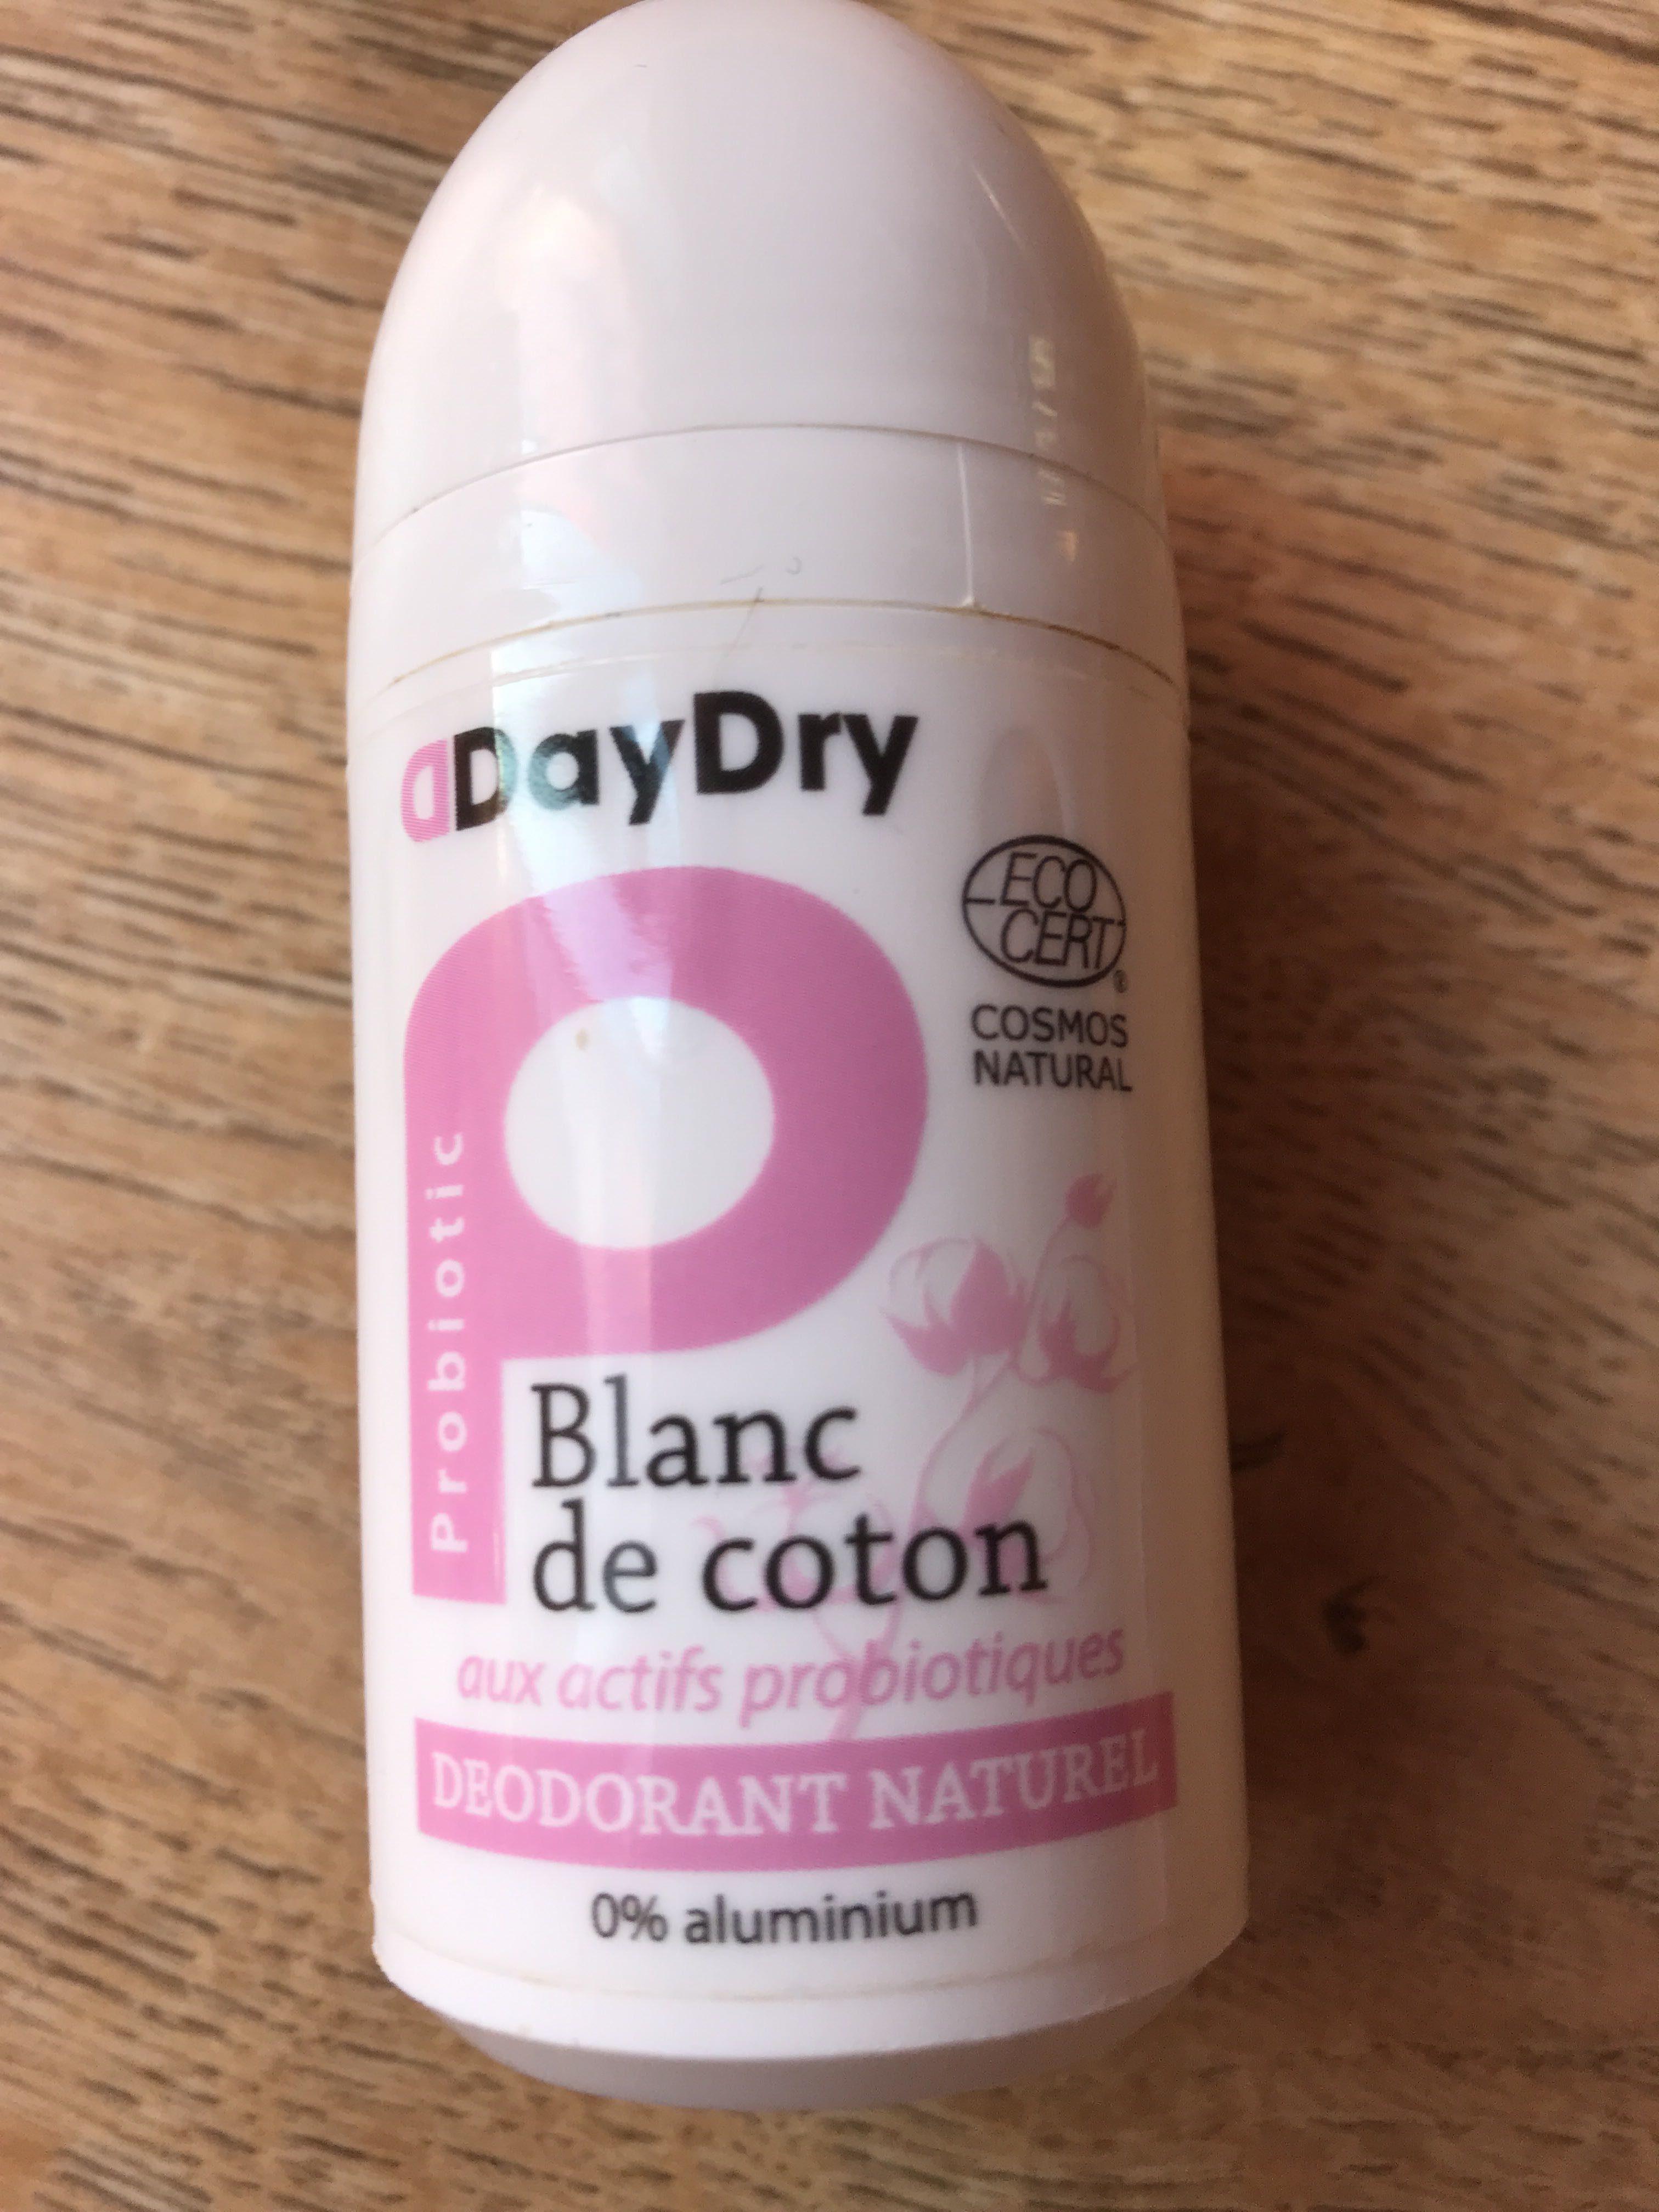 Déodorant naturel - Product - fr